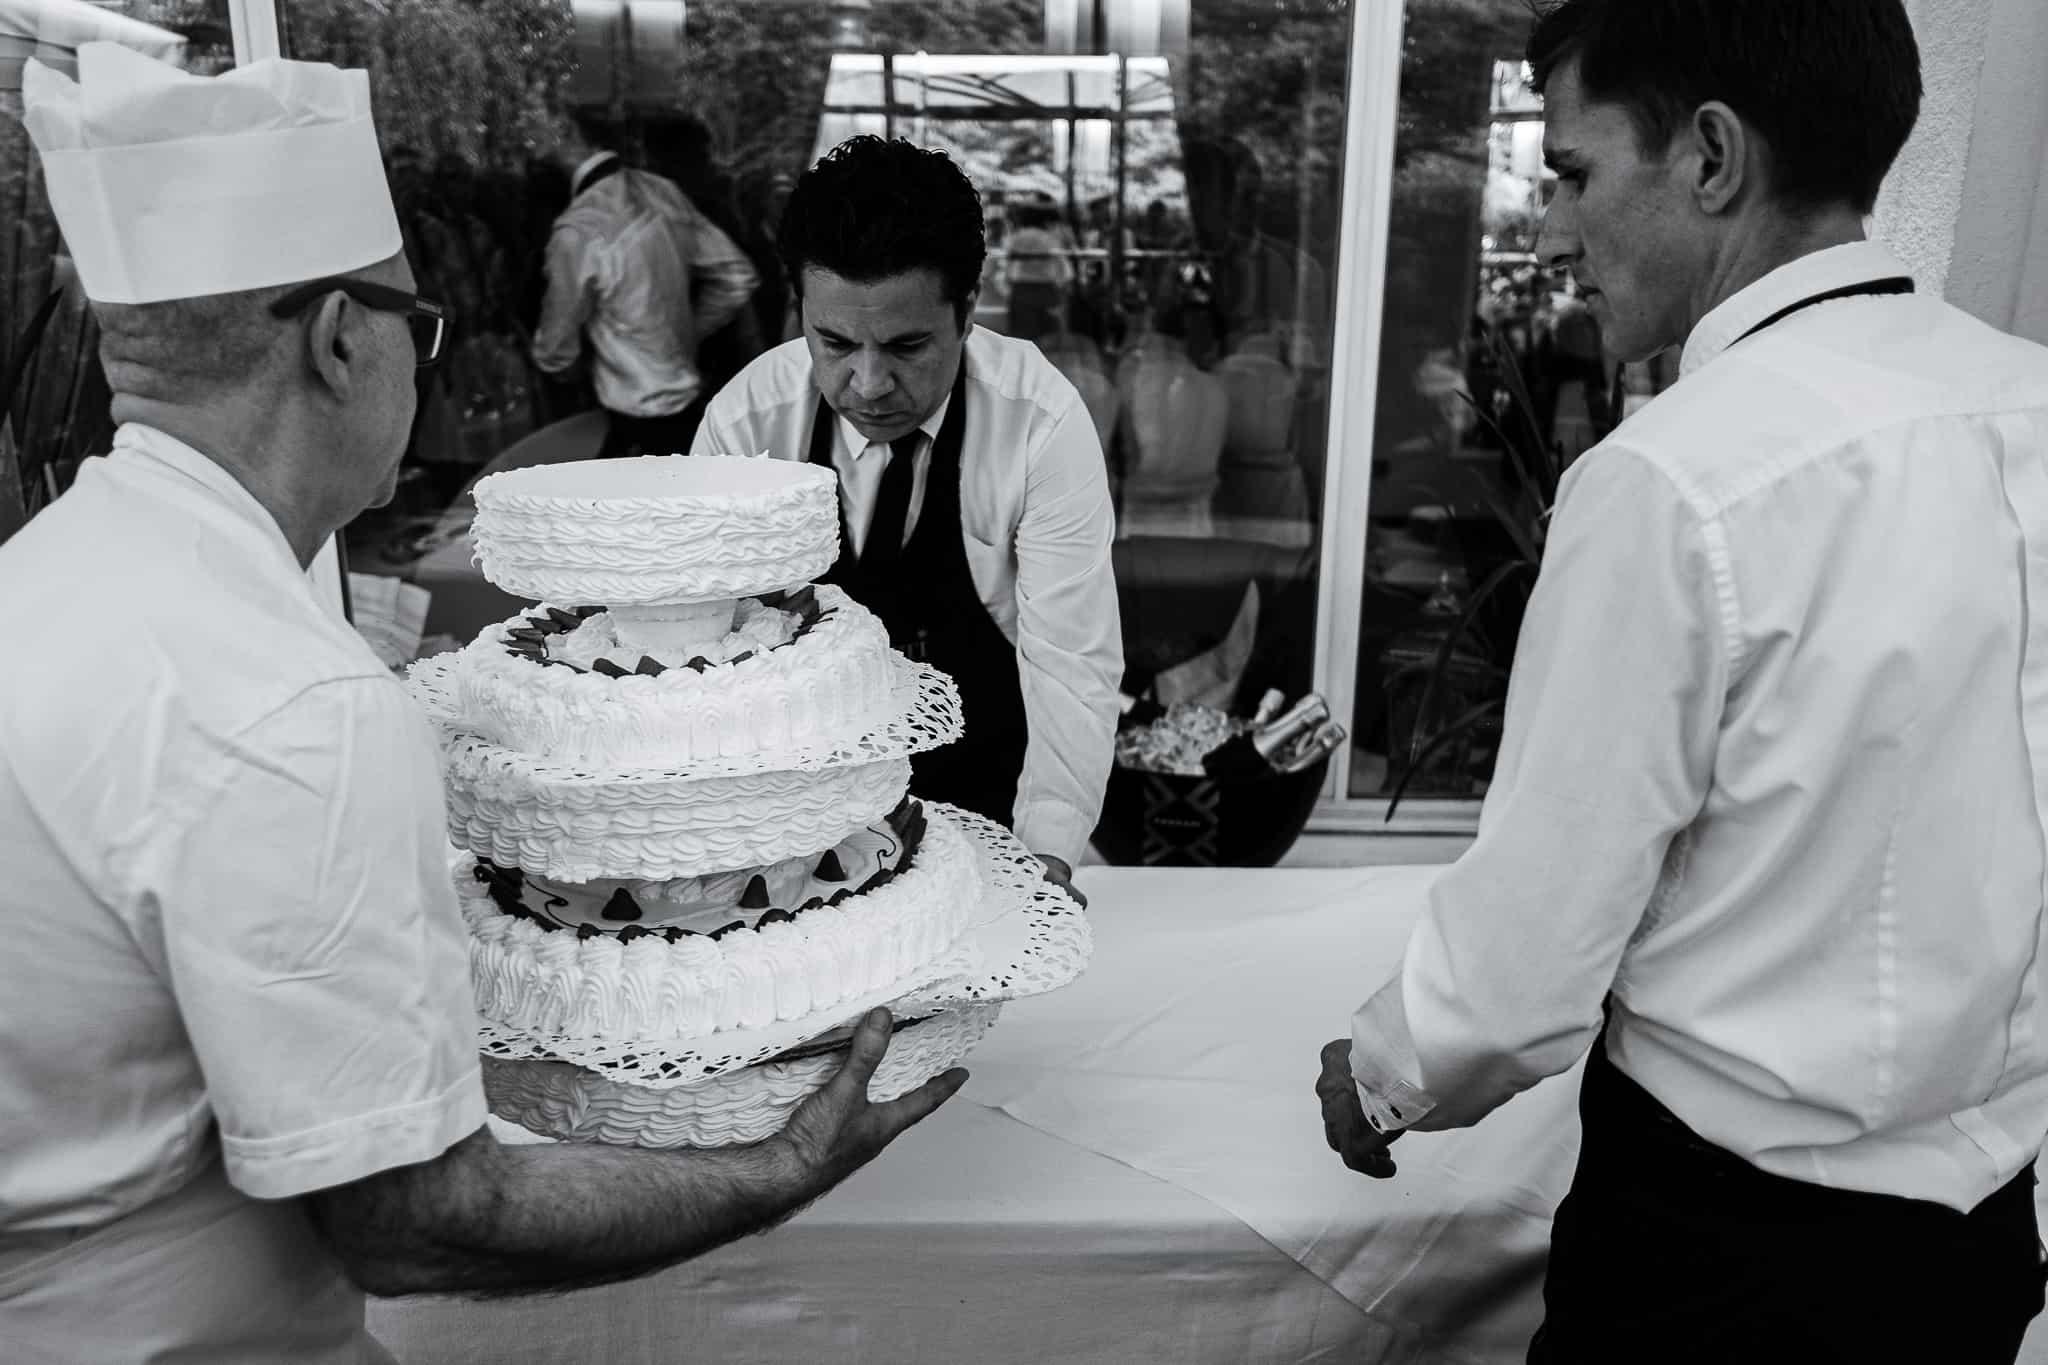 matrimonio Canter Milano San siro Luca rossi wedding reportage 0056